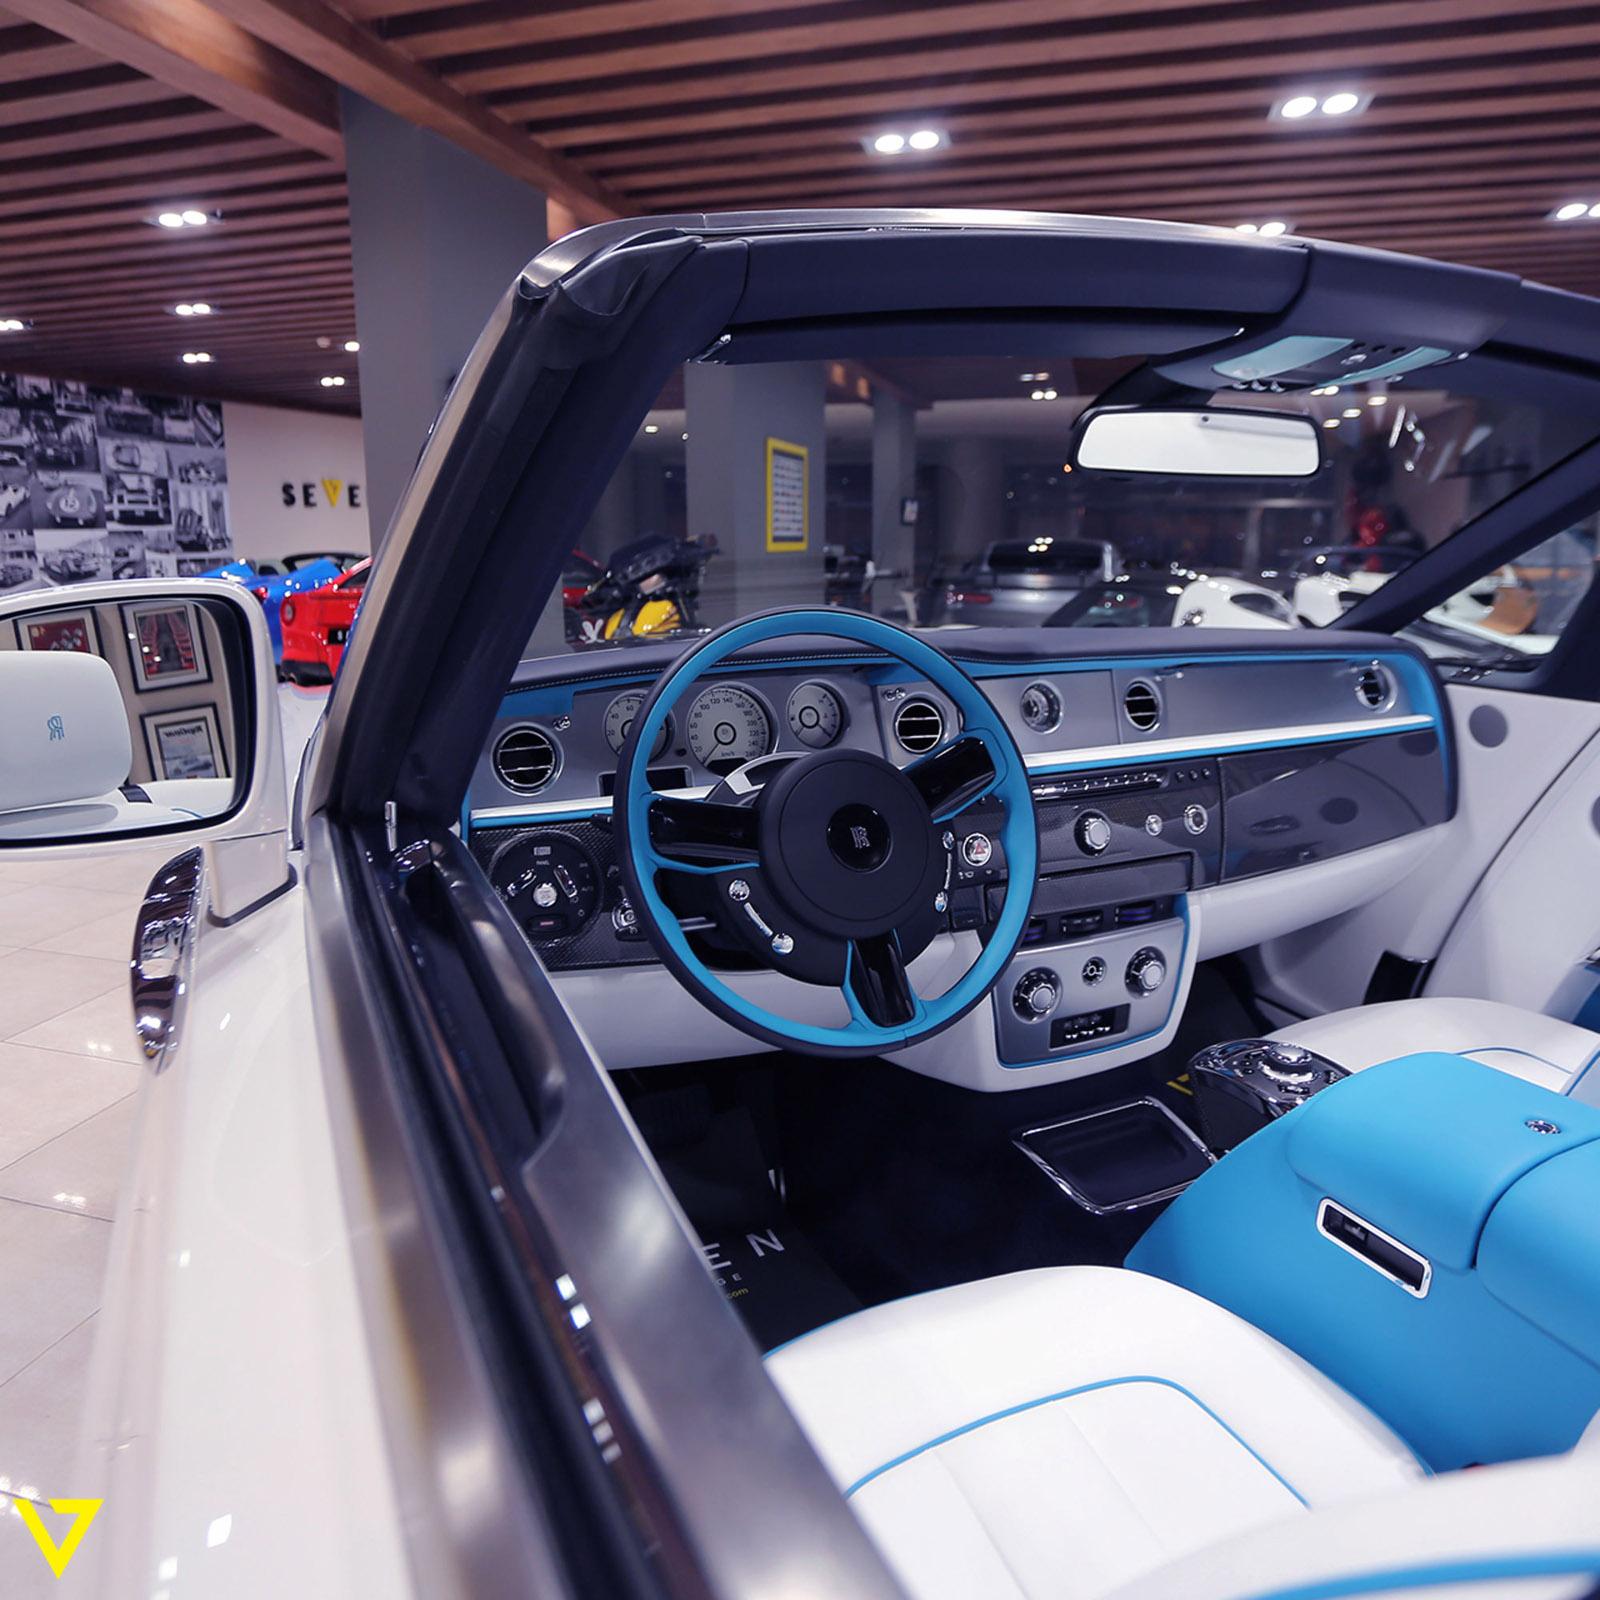 Rolls-Royce_Phantom_Drophead_Coupe_Last-of-Last_edition_05